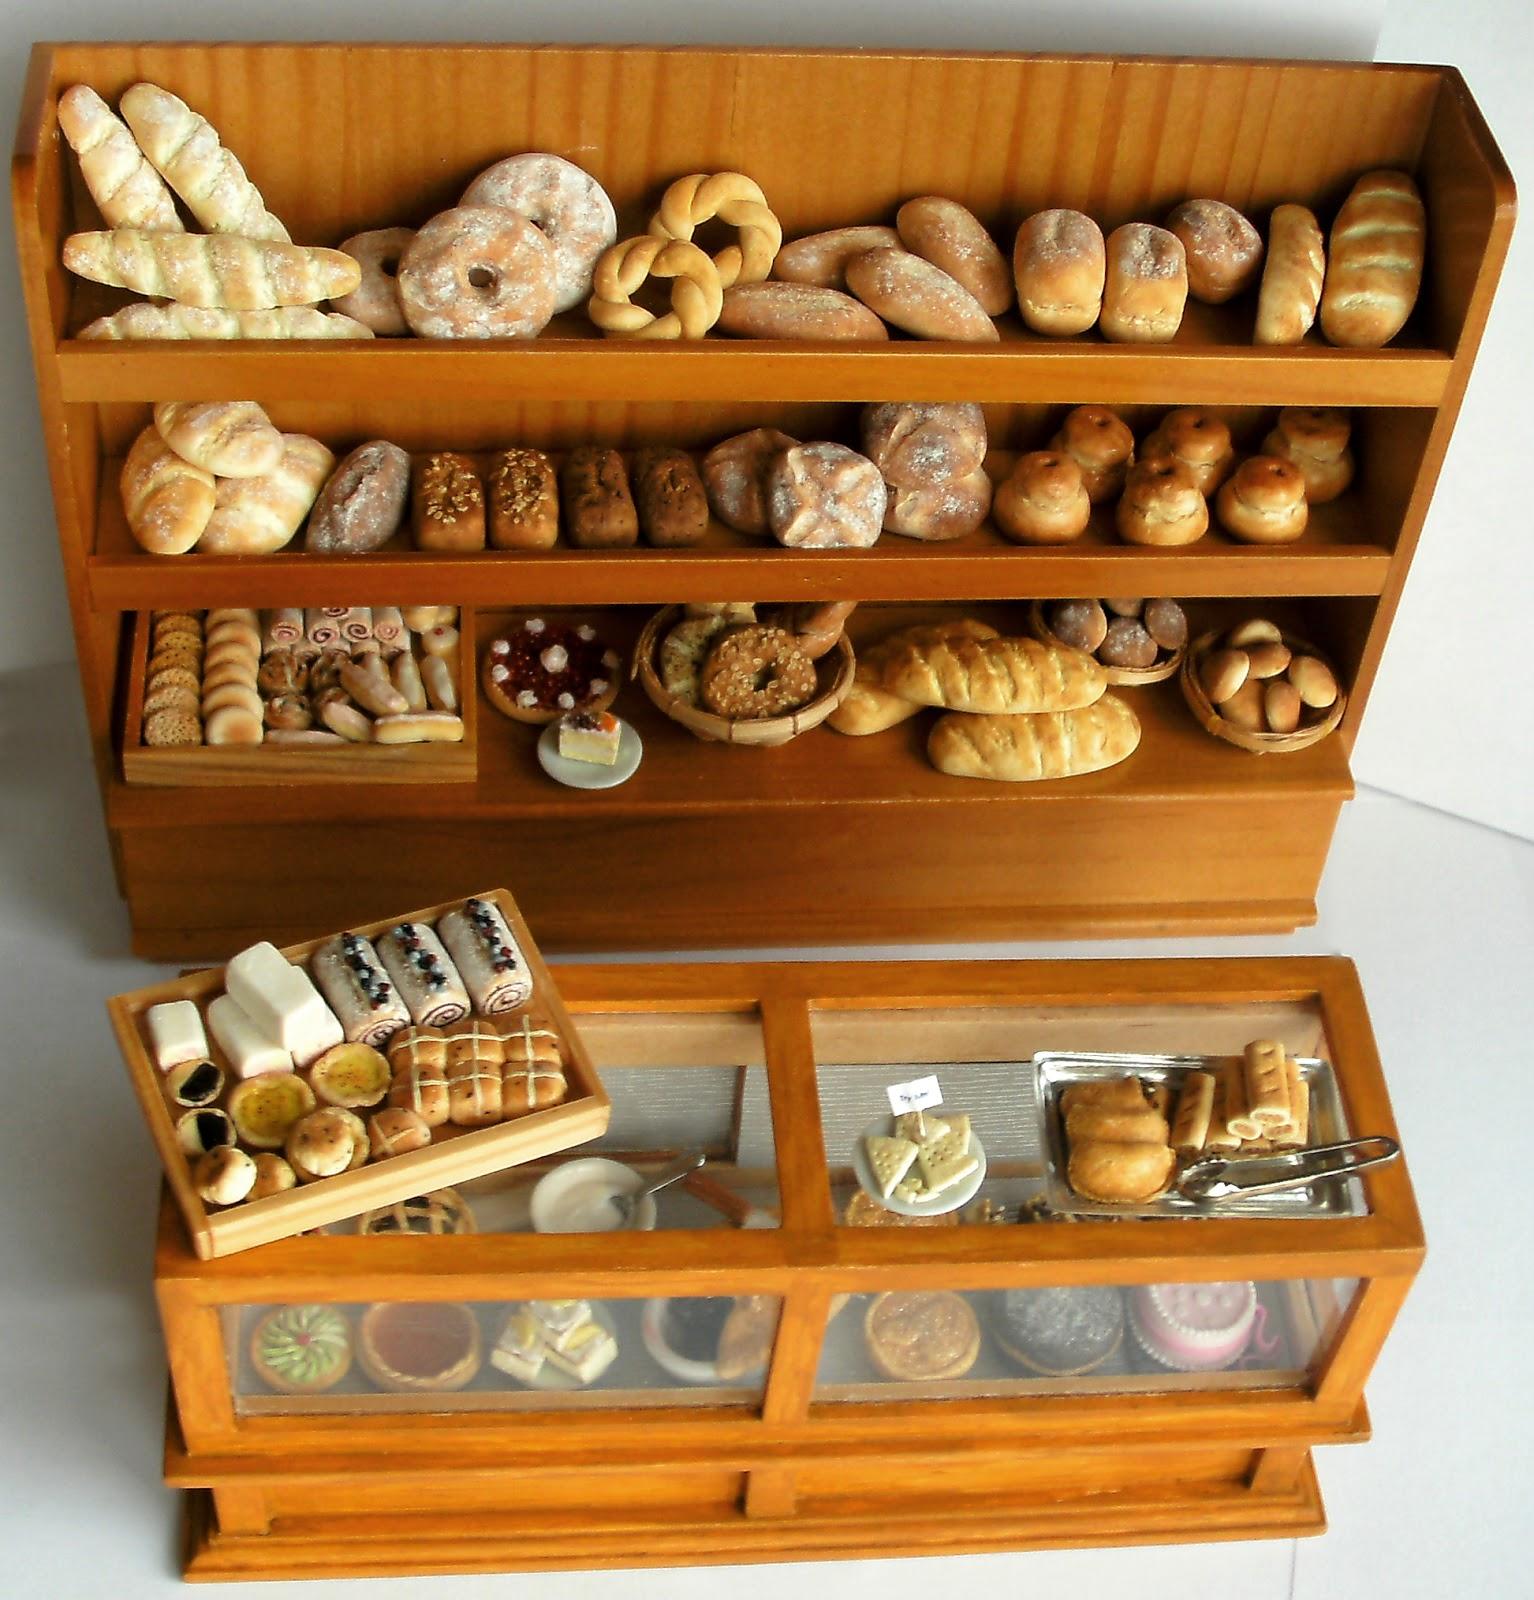 Homewardflight: The English Bakery!